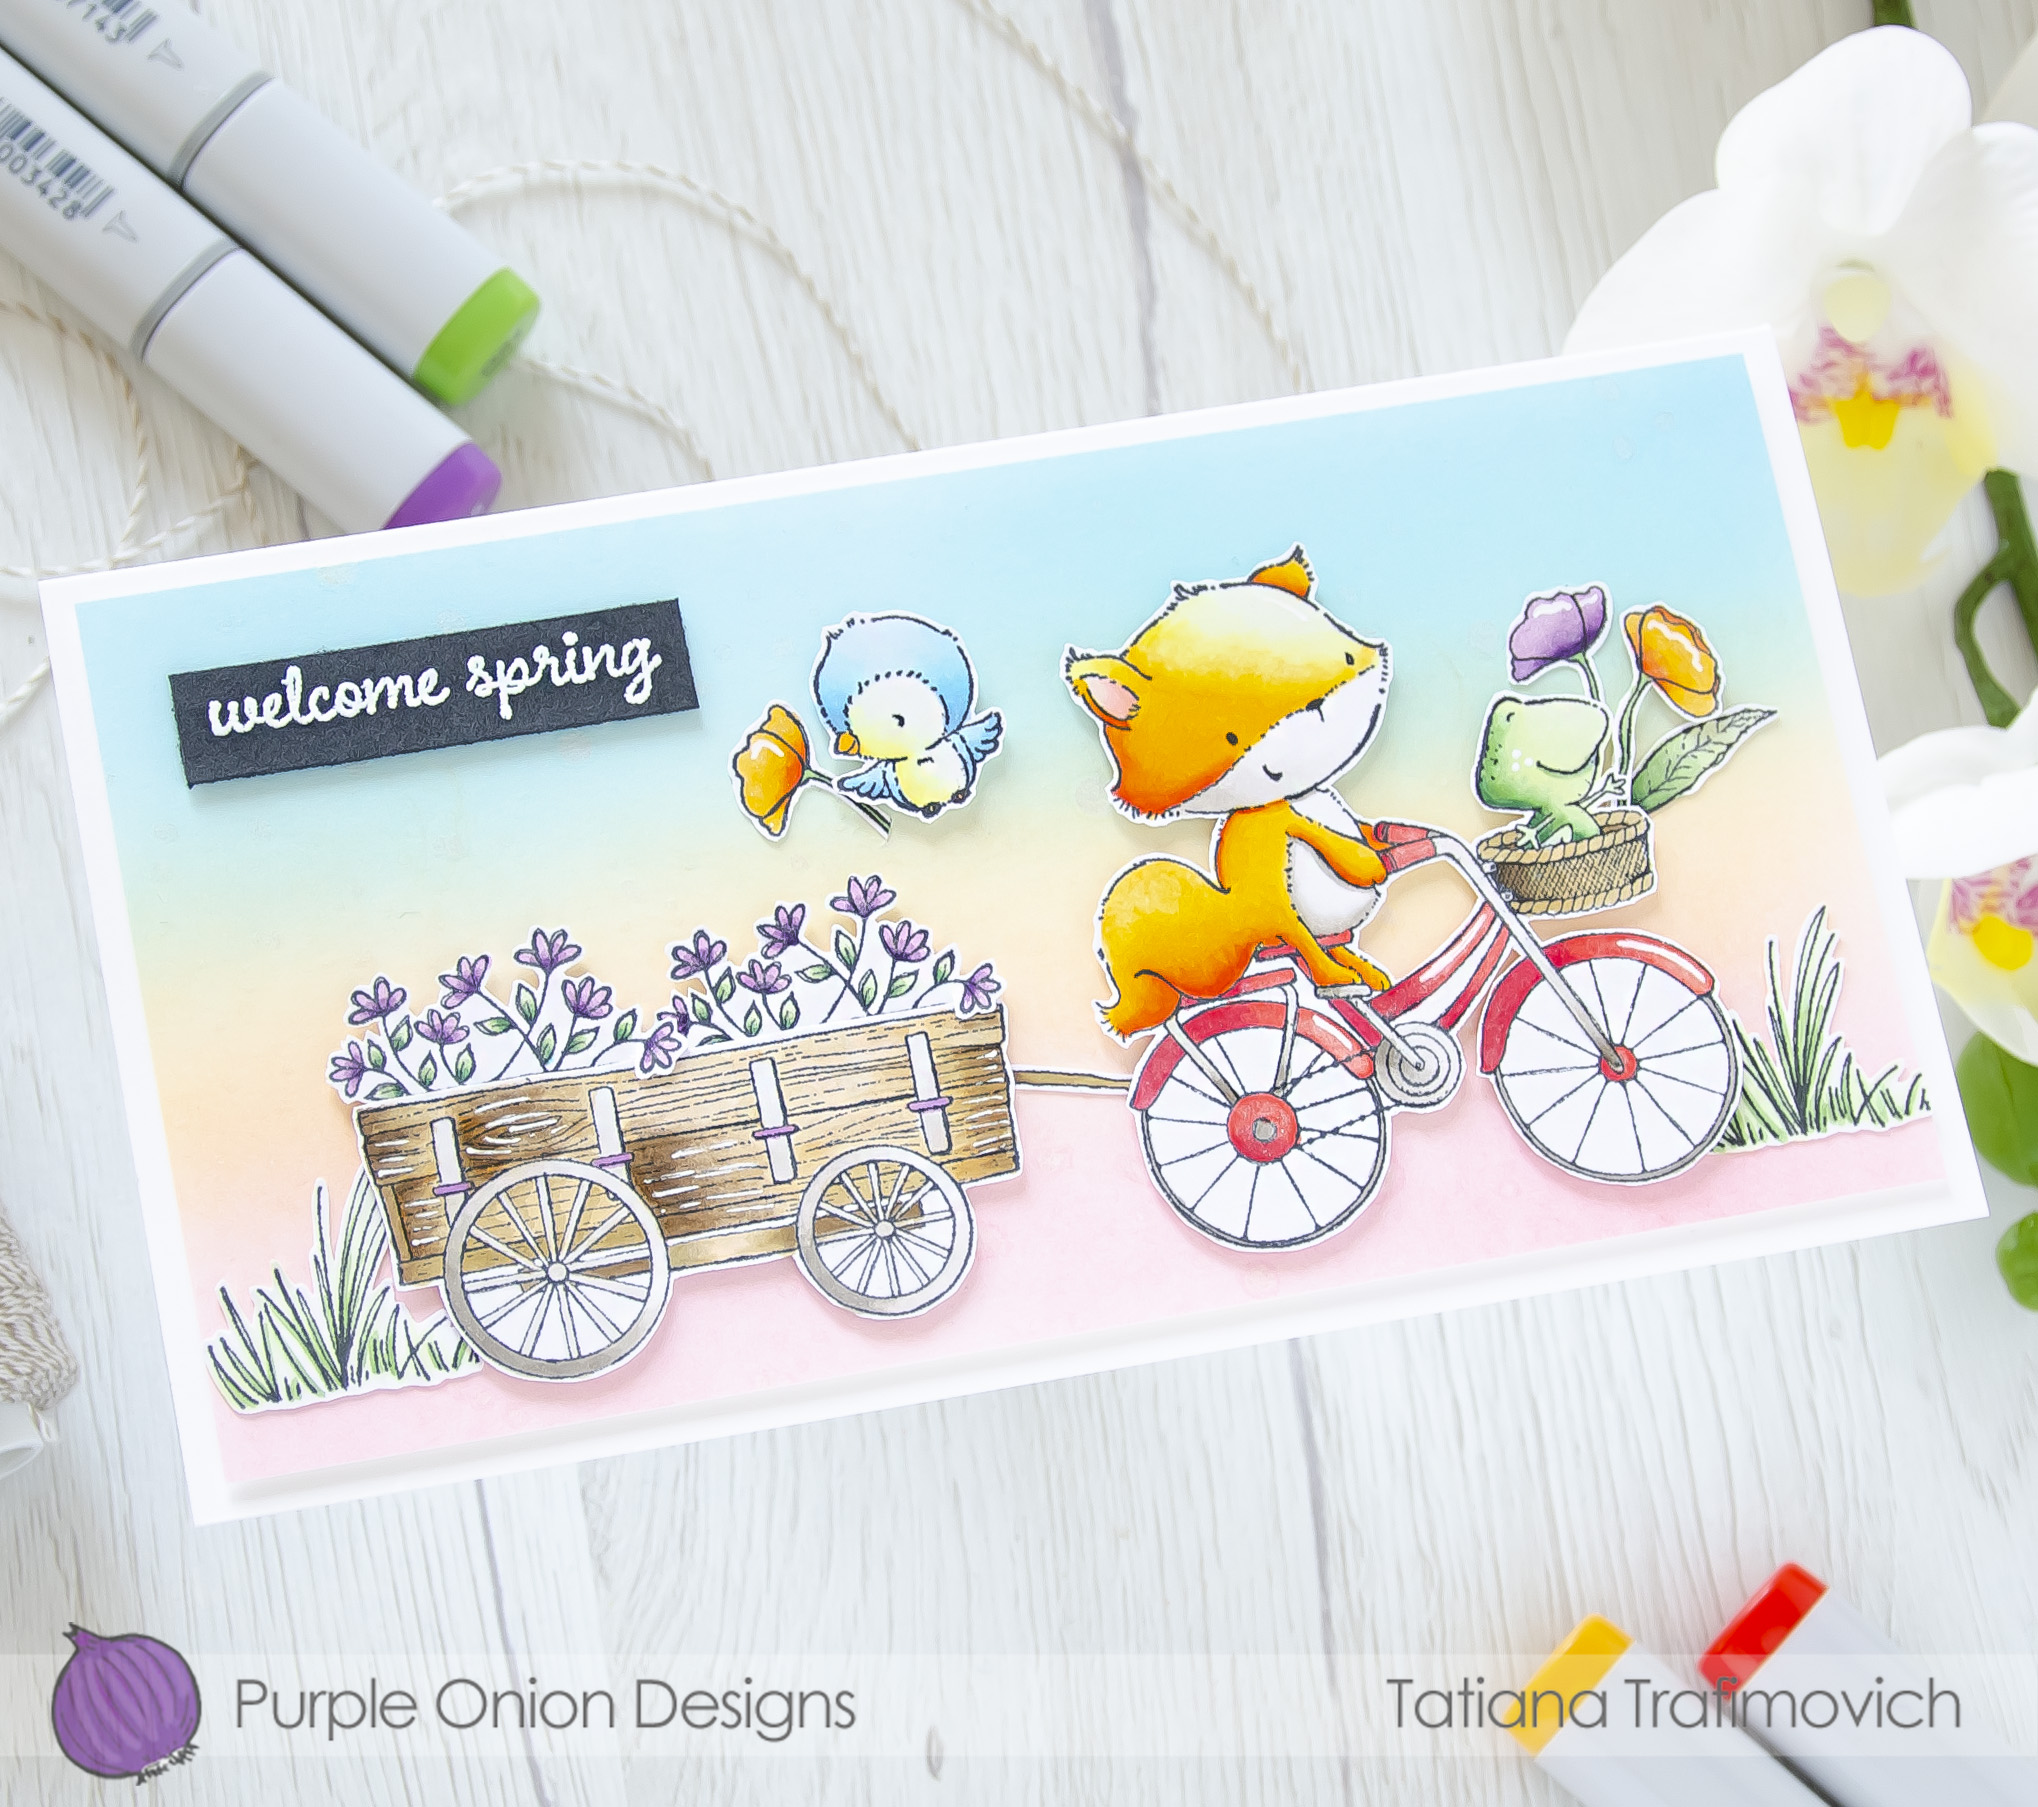 Welcome Spring #handmade card by Tatiana Trafimovich #tatianacraftandart - stamps by Purple Onion Designs